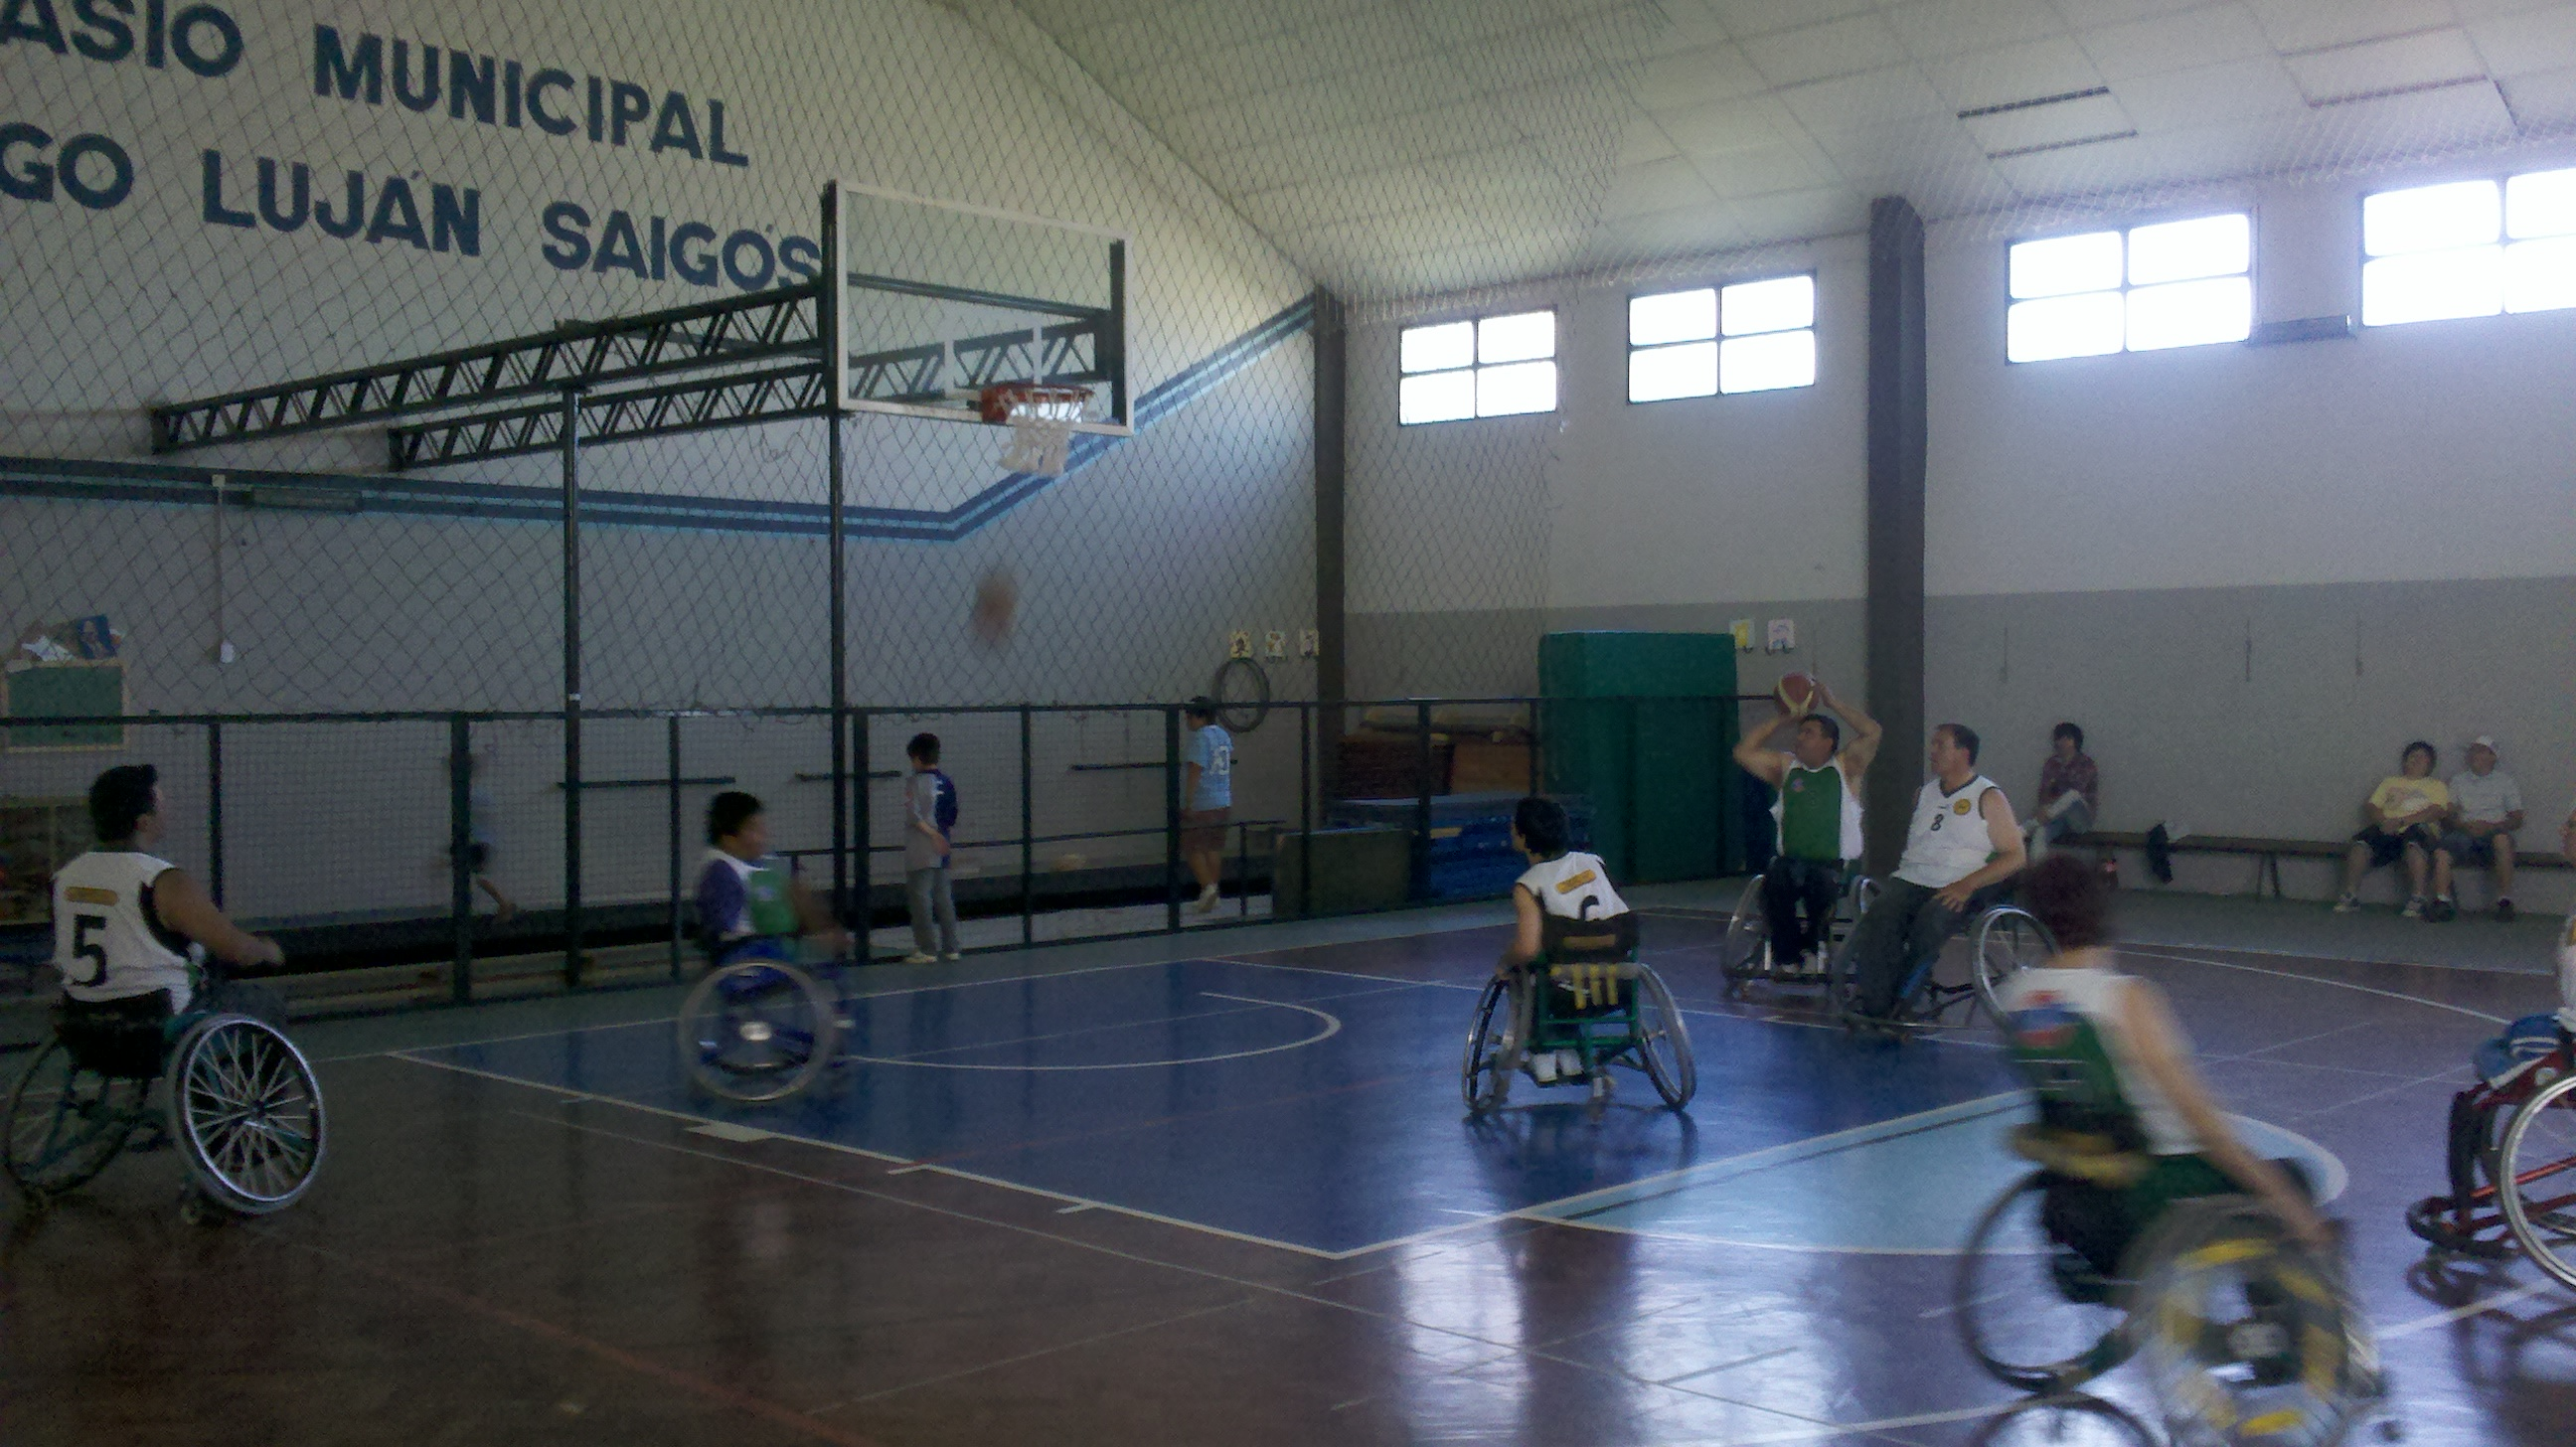 Encuentro de jugadores de básquet con capacidades diferentes